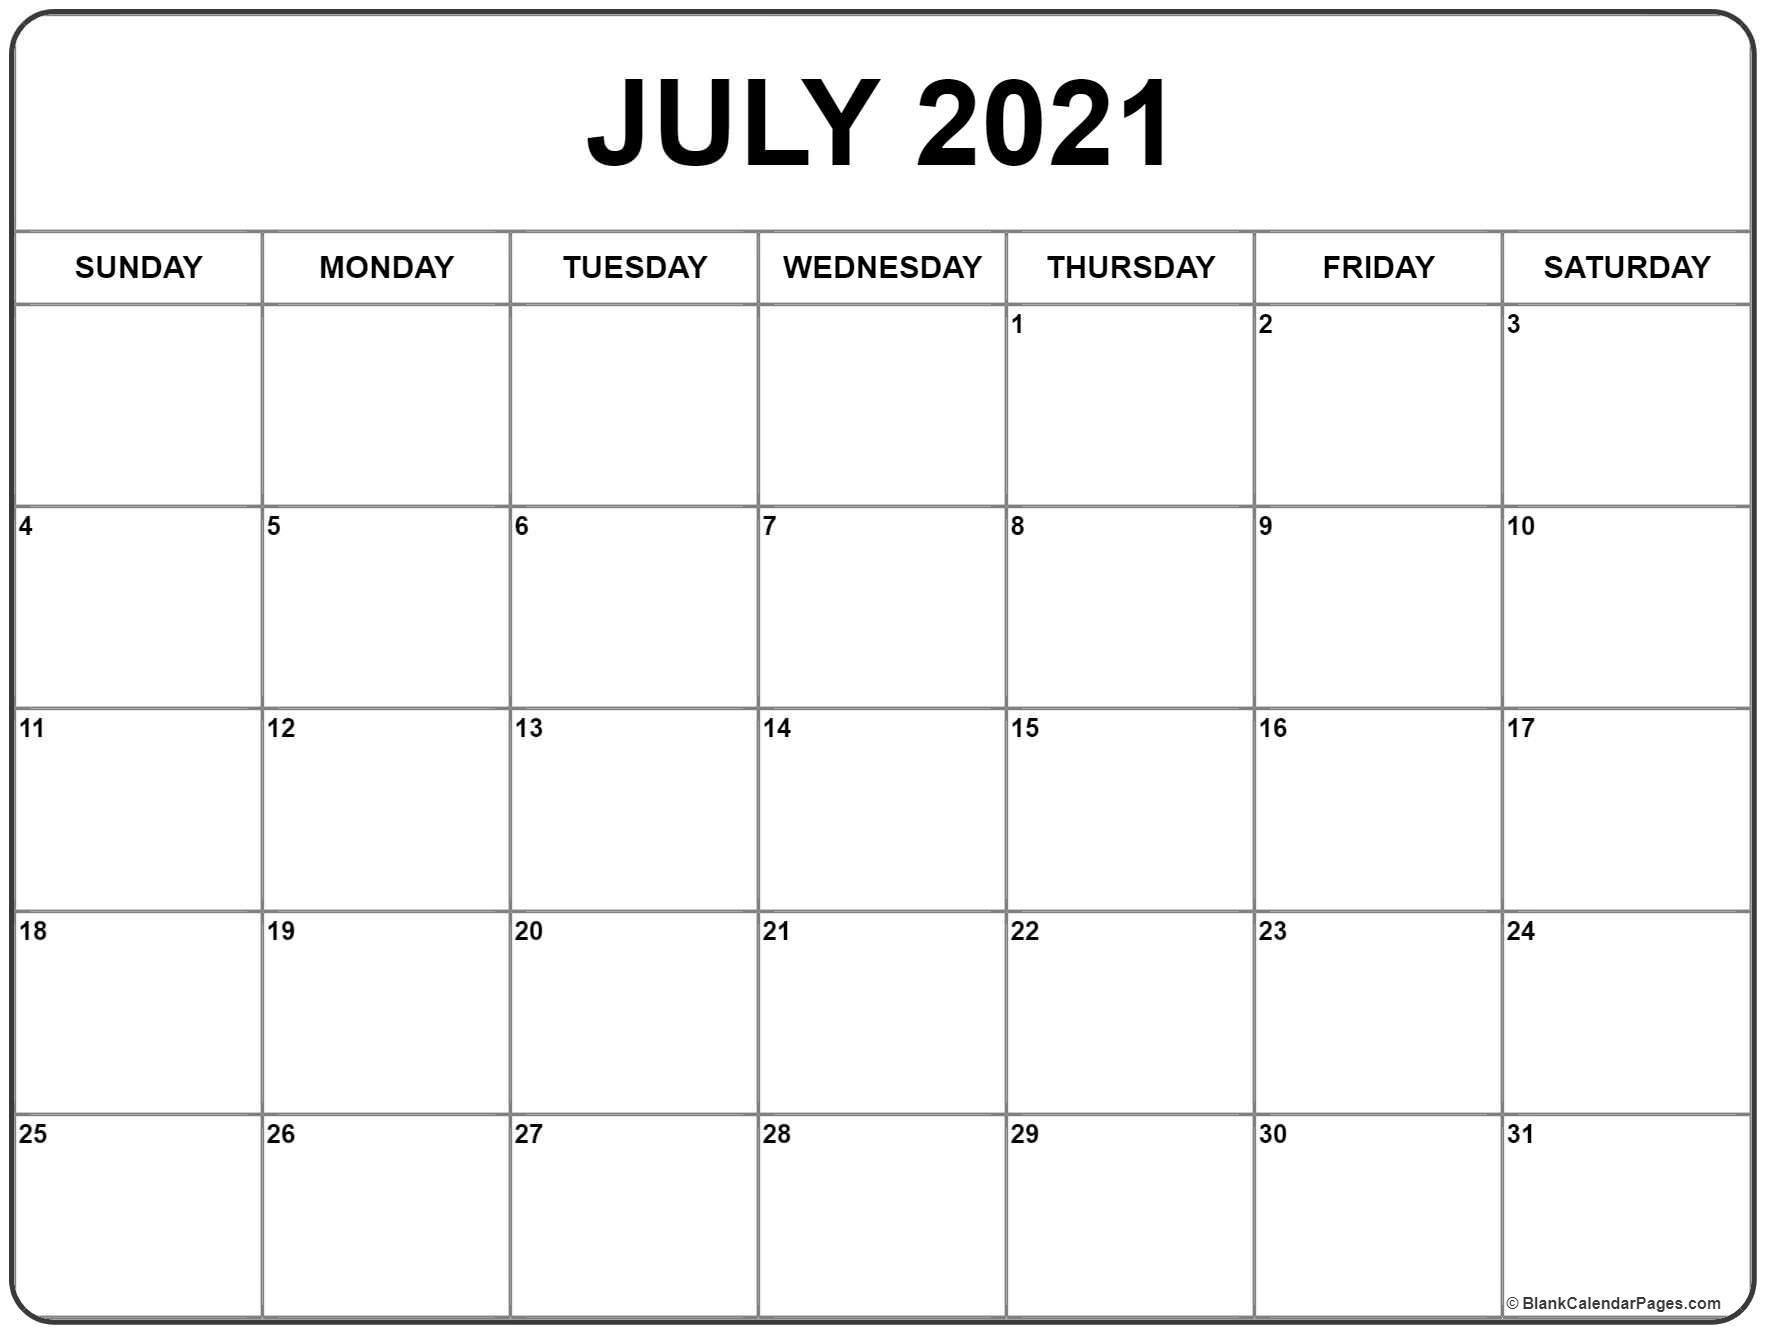 July 2021 Calendar | Free Printable Monthly Calendars-Free Blank No Date Printable Calendar 2021